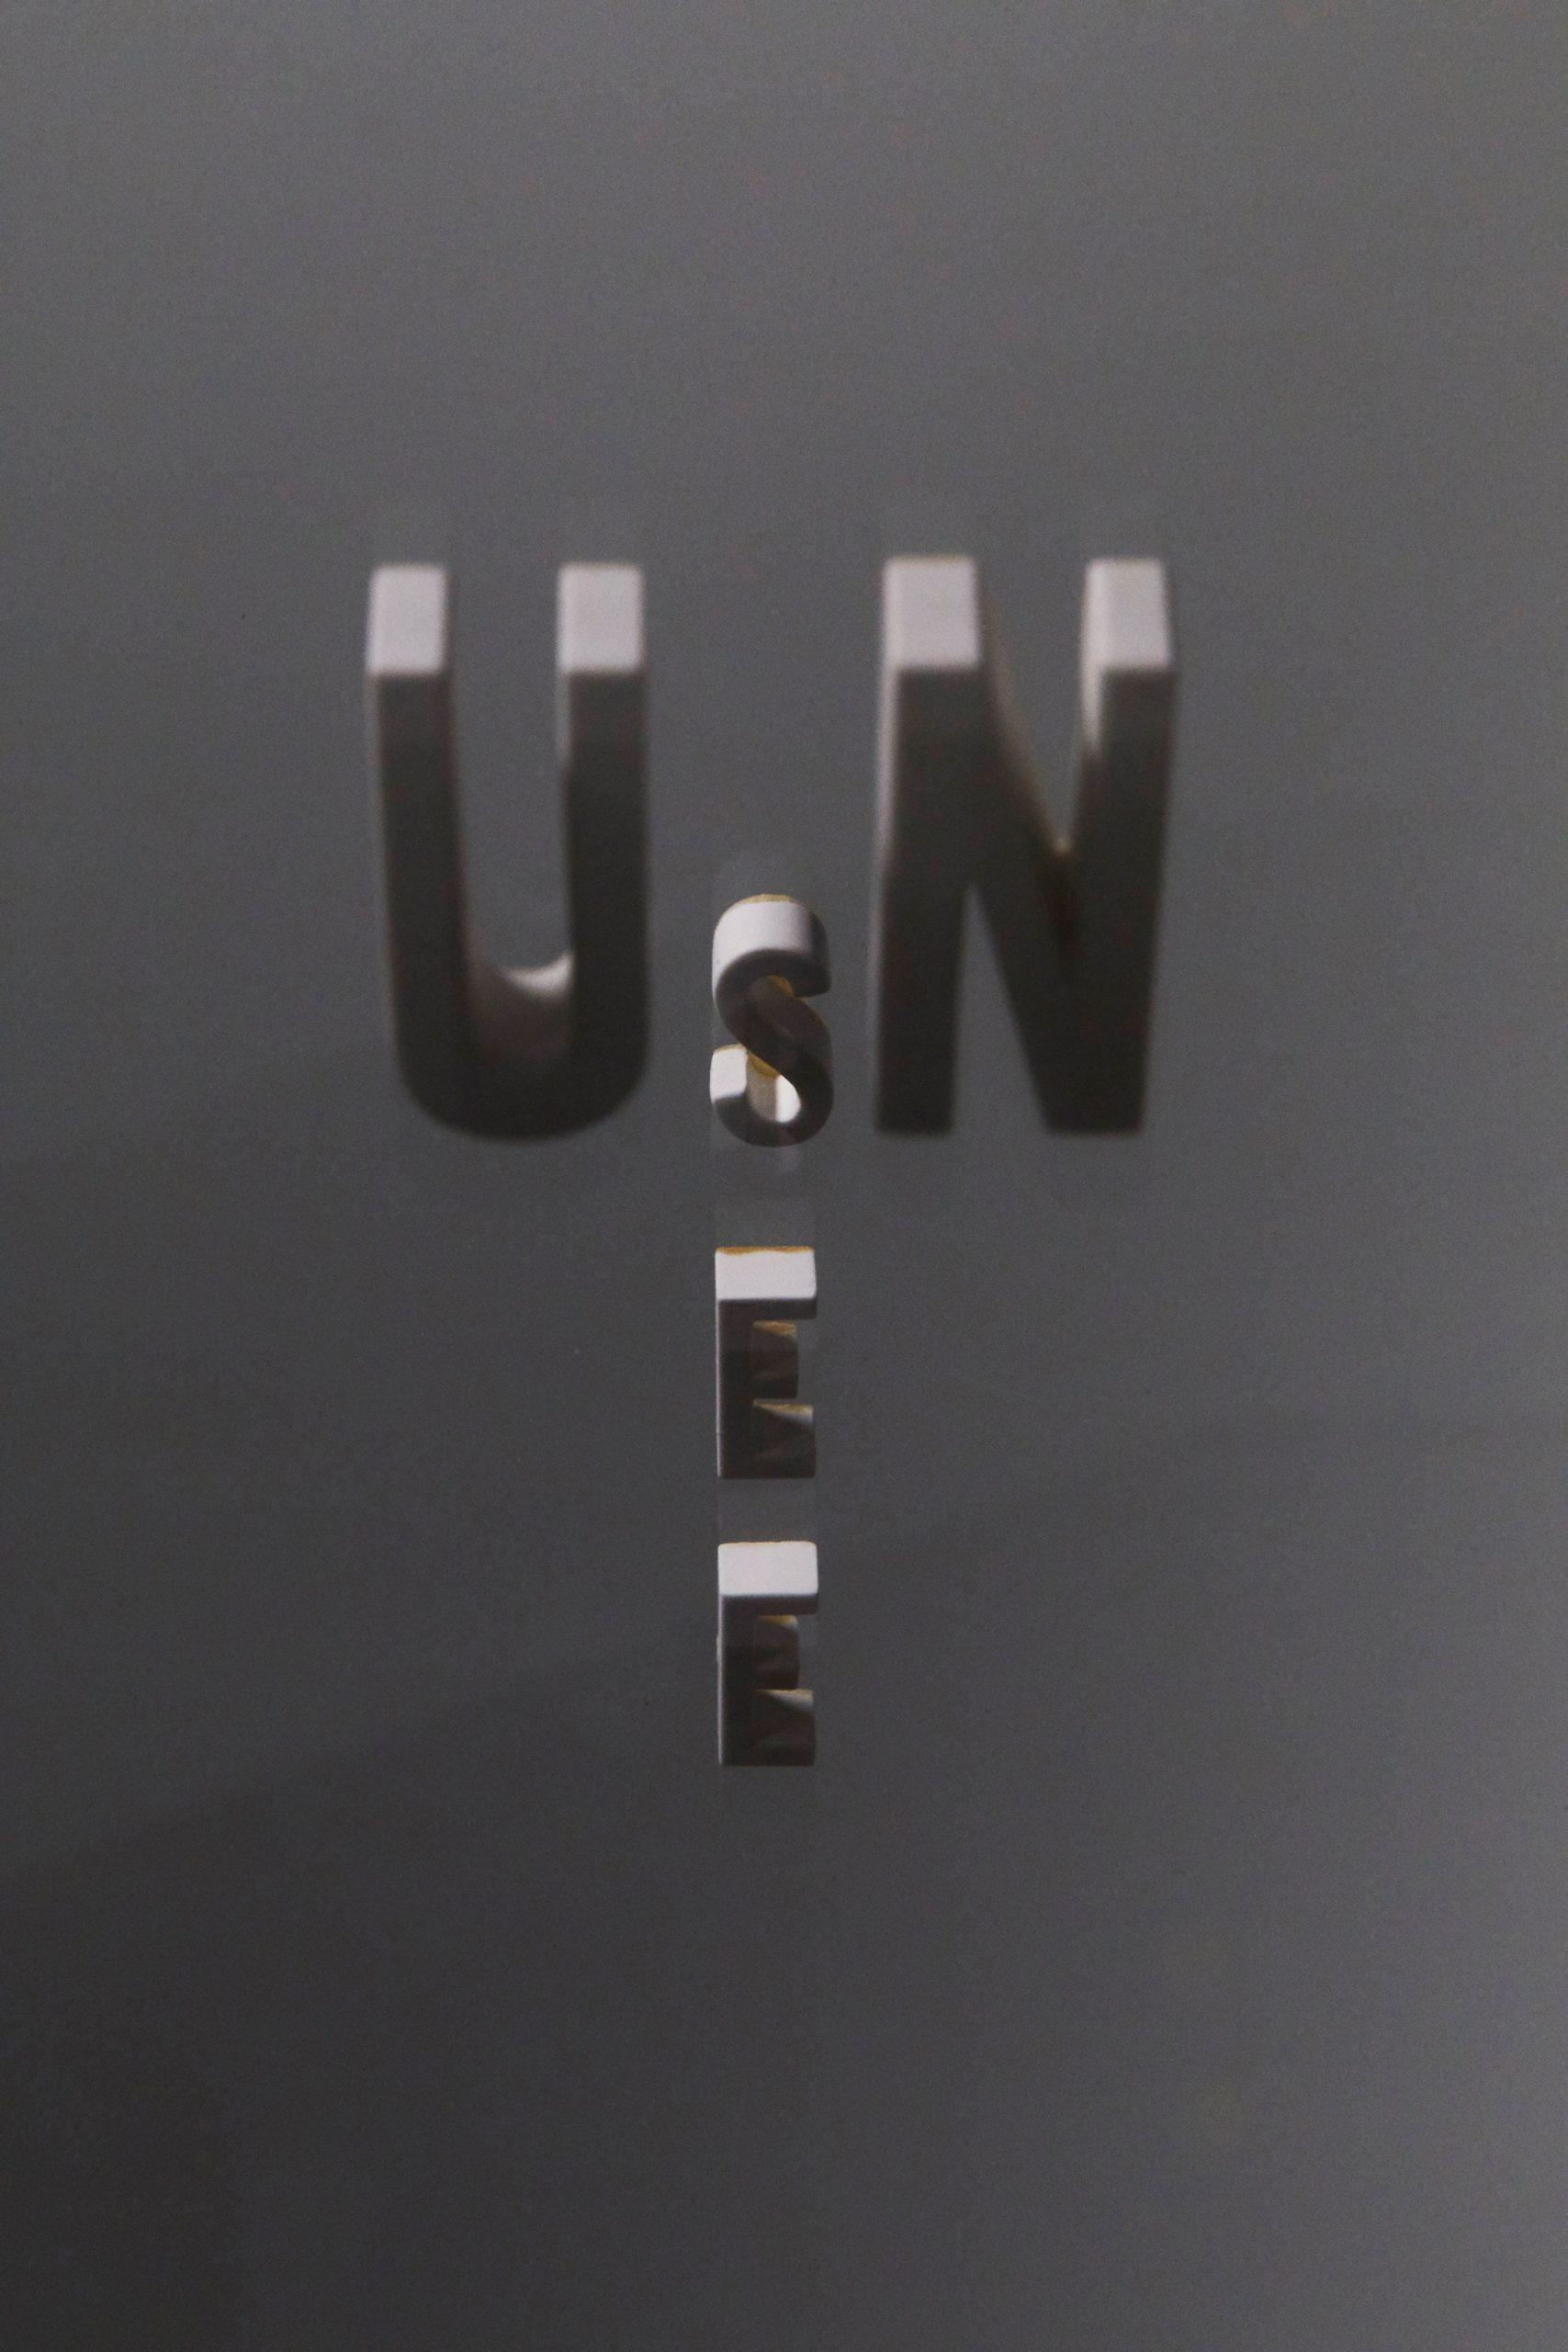 Paul Orenstein , Unsee, 2019